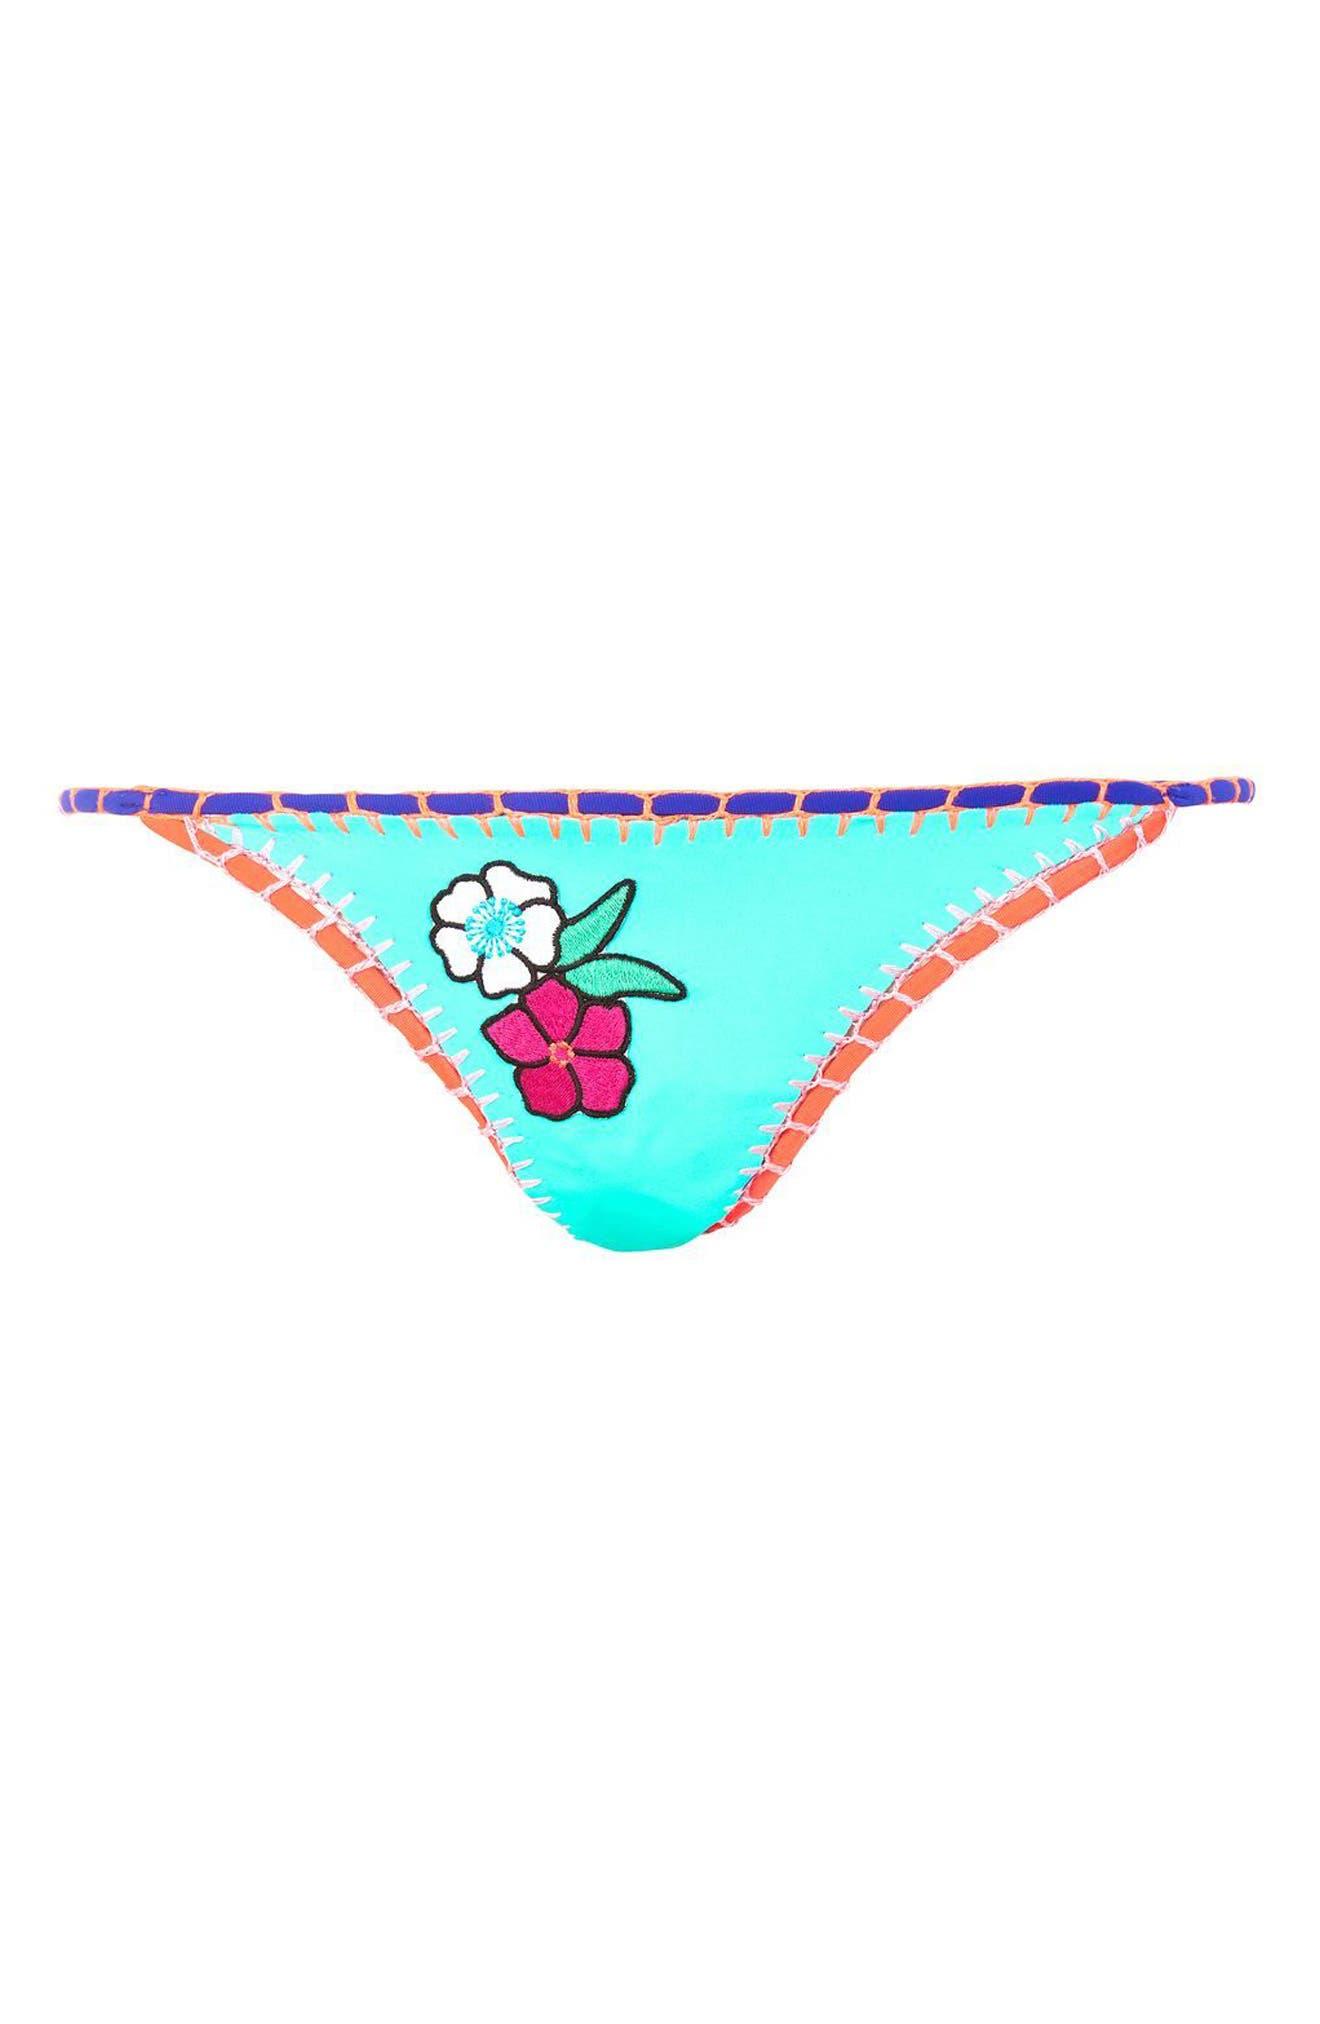 TOPSHOP, Embroidered Crochet Bikini Bottoms, Alternate thumbnail 3, color, 400